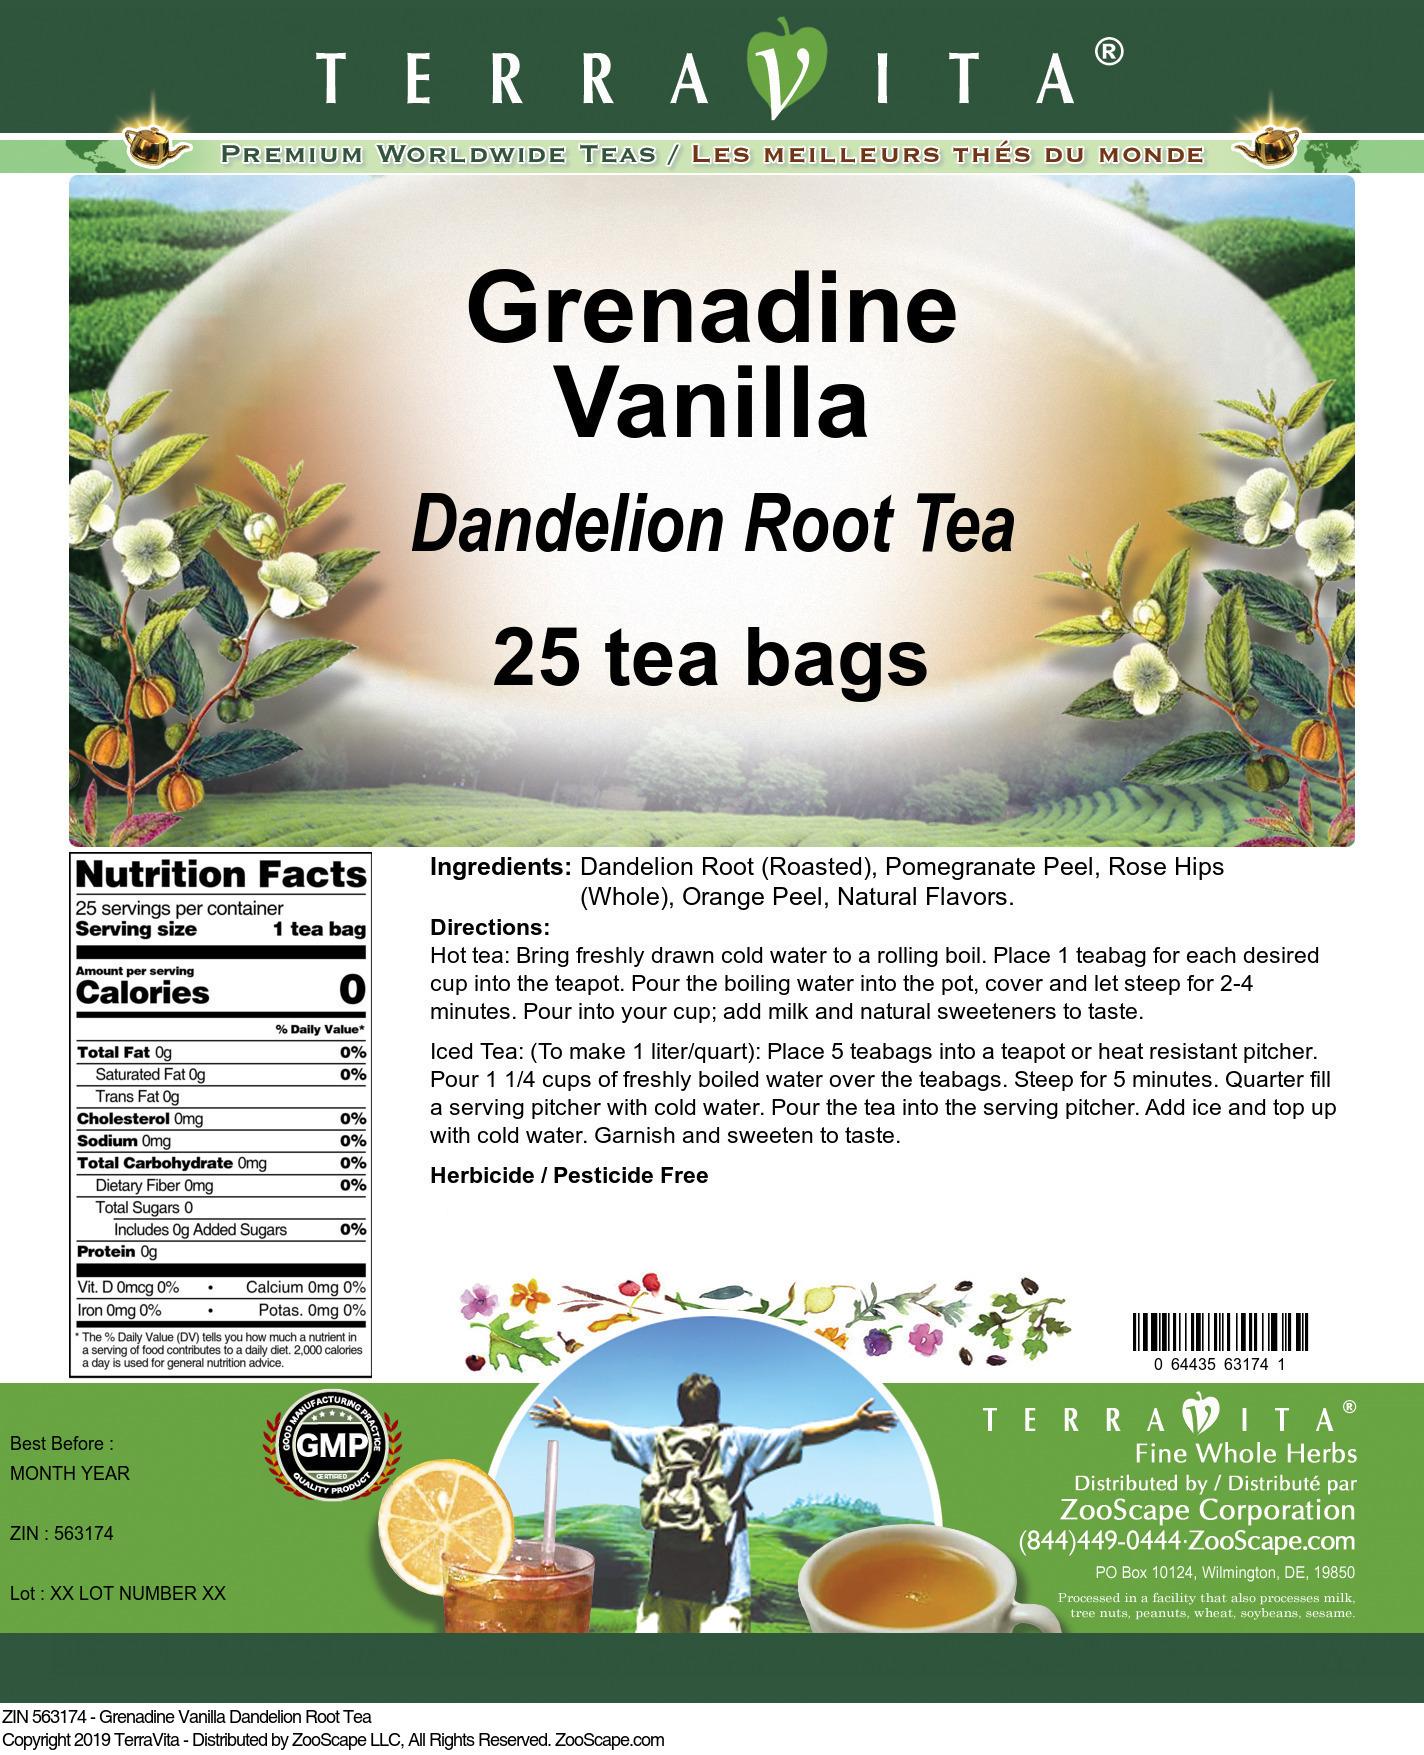 Grenadine Vanilla Dandelion Root Tea